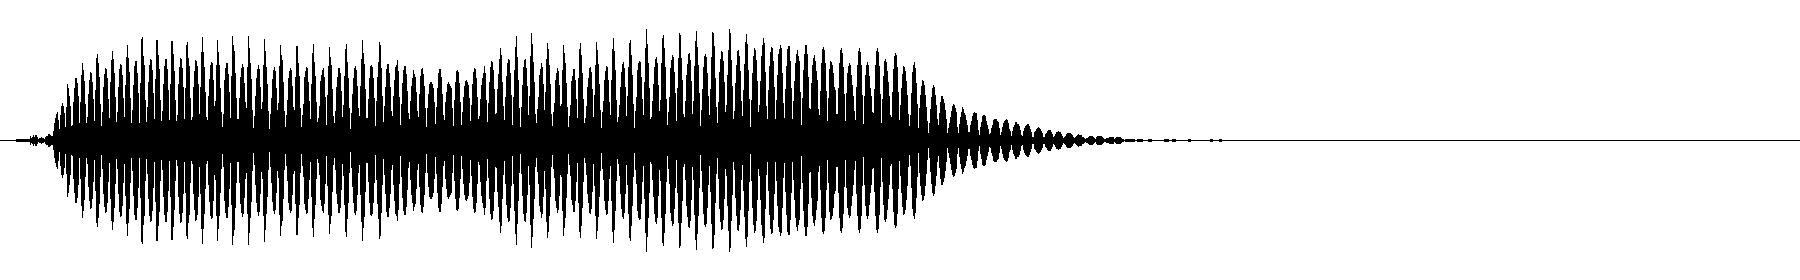 alvinbary 18